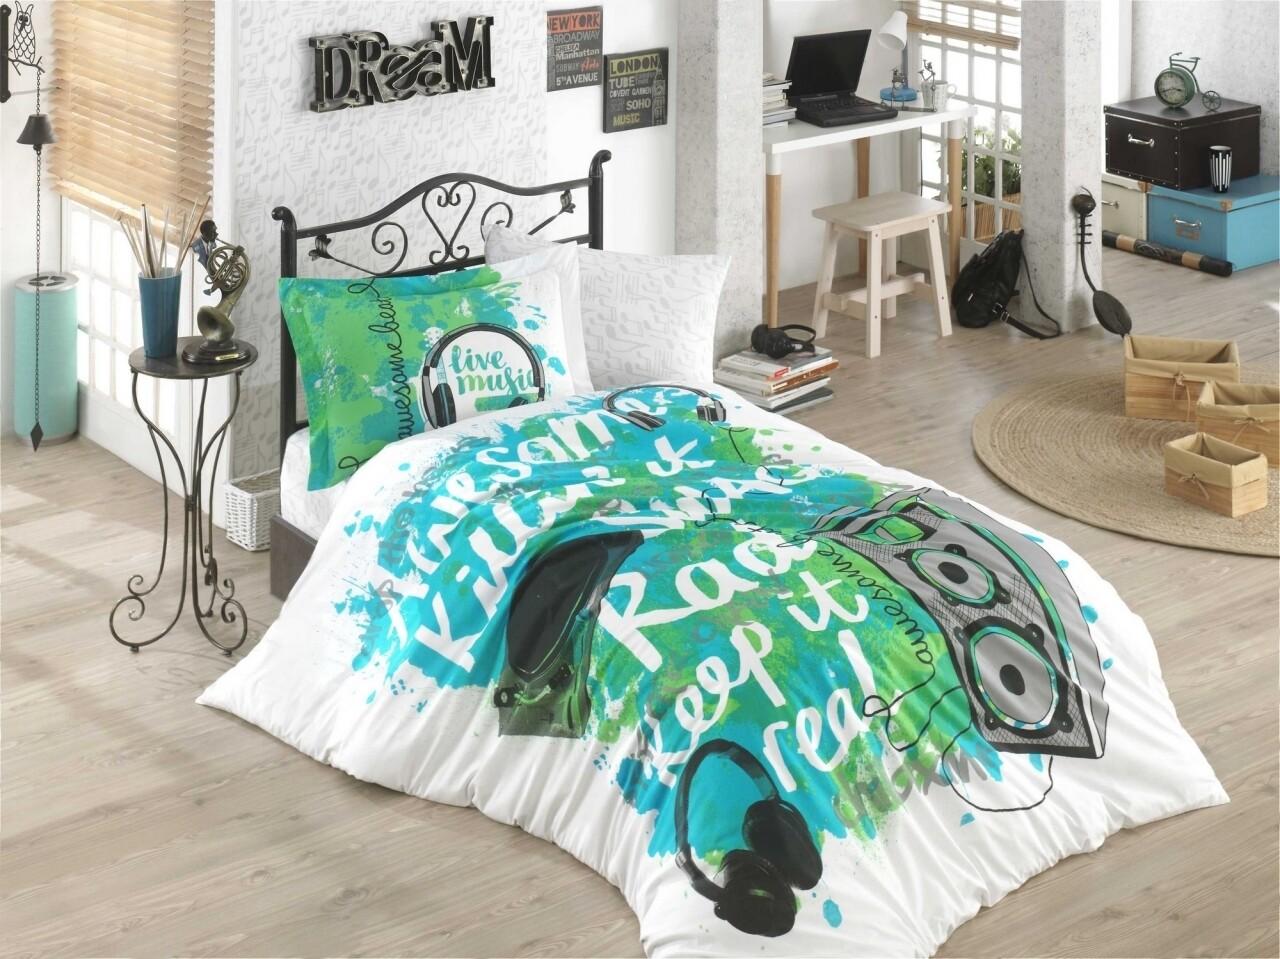 Lenjerie de pat pentru o persoana, Live Music Green, Hobby, 3 piese, 160 x 240 cm, 100% bumbac poplin, verde/alb